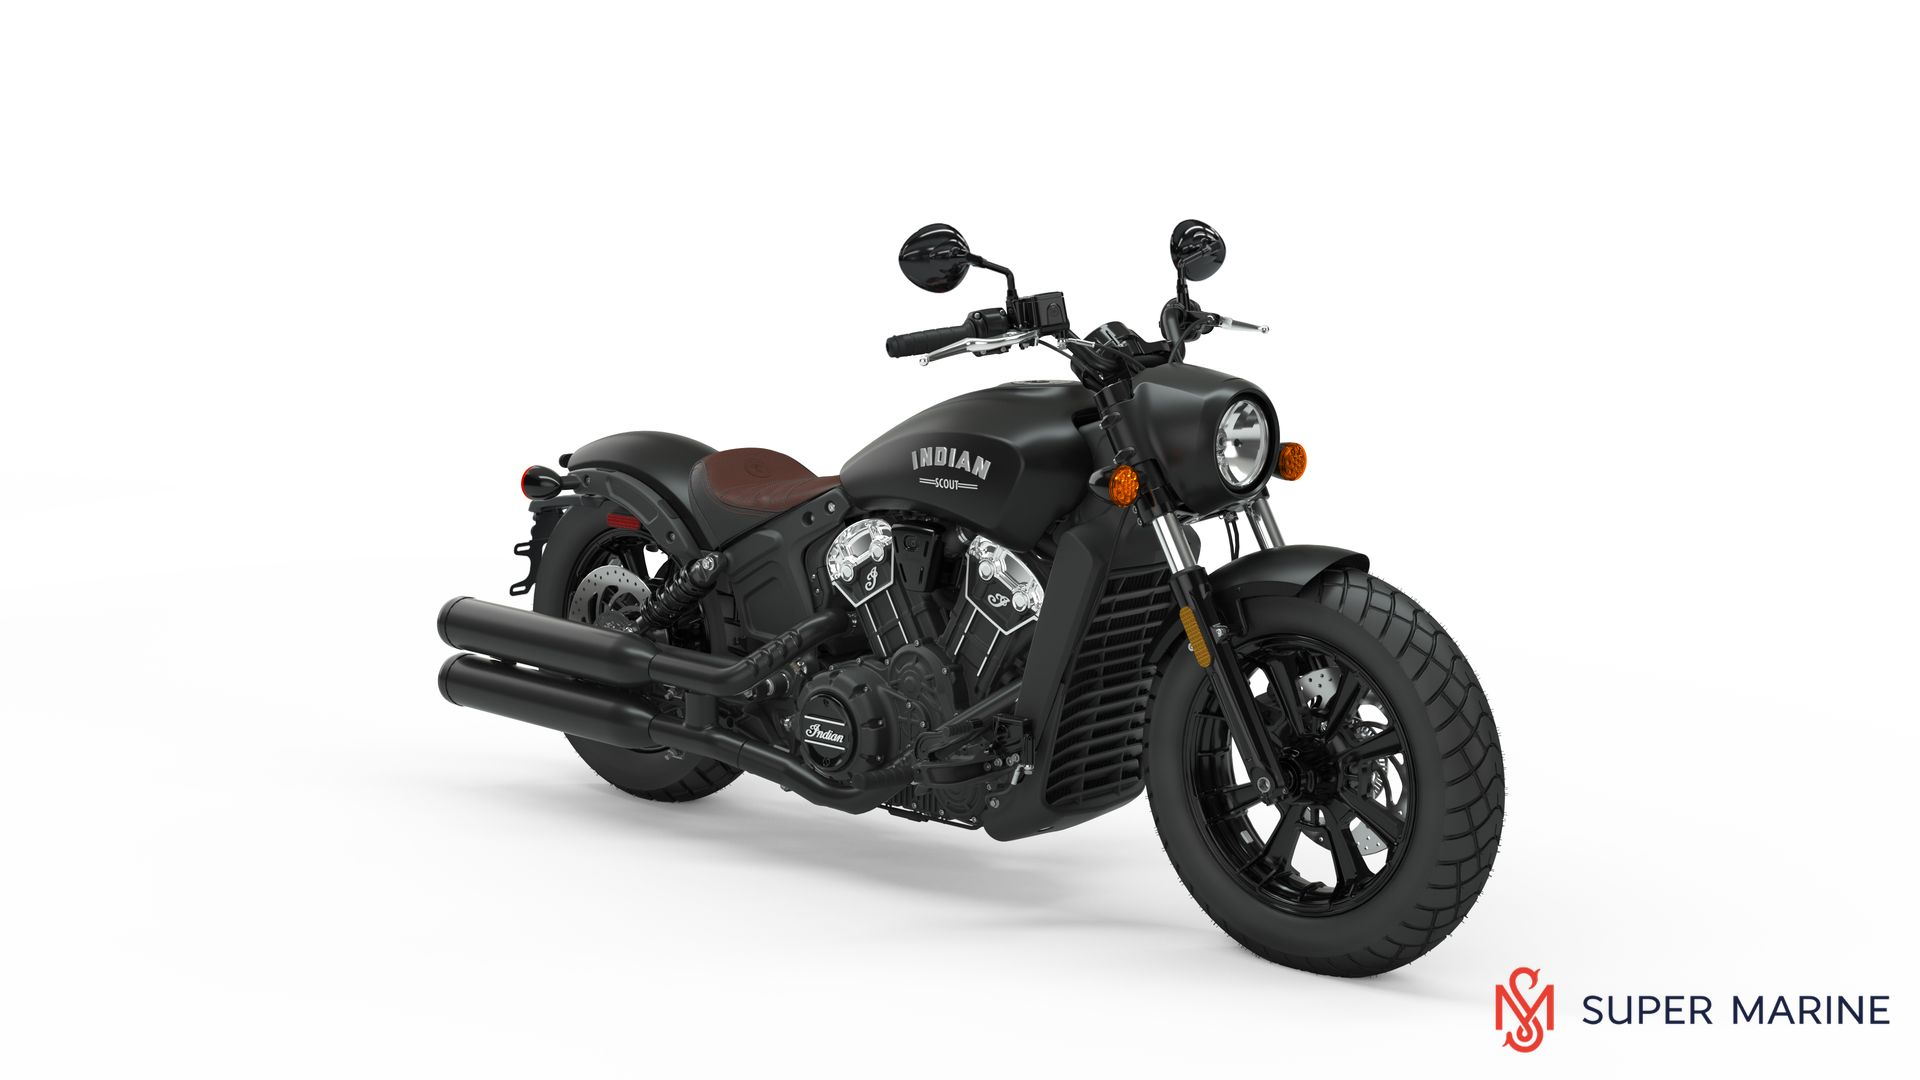 Мотоцикл Indian Scout Bobber Thunder Black Smoke 2020 - 1